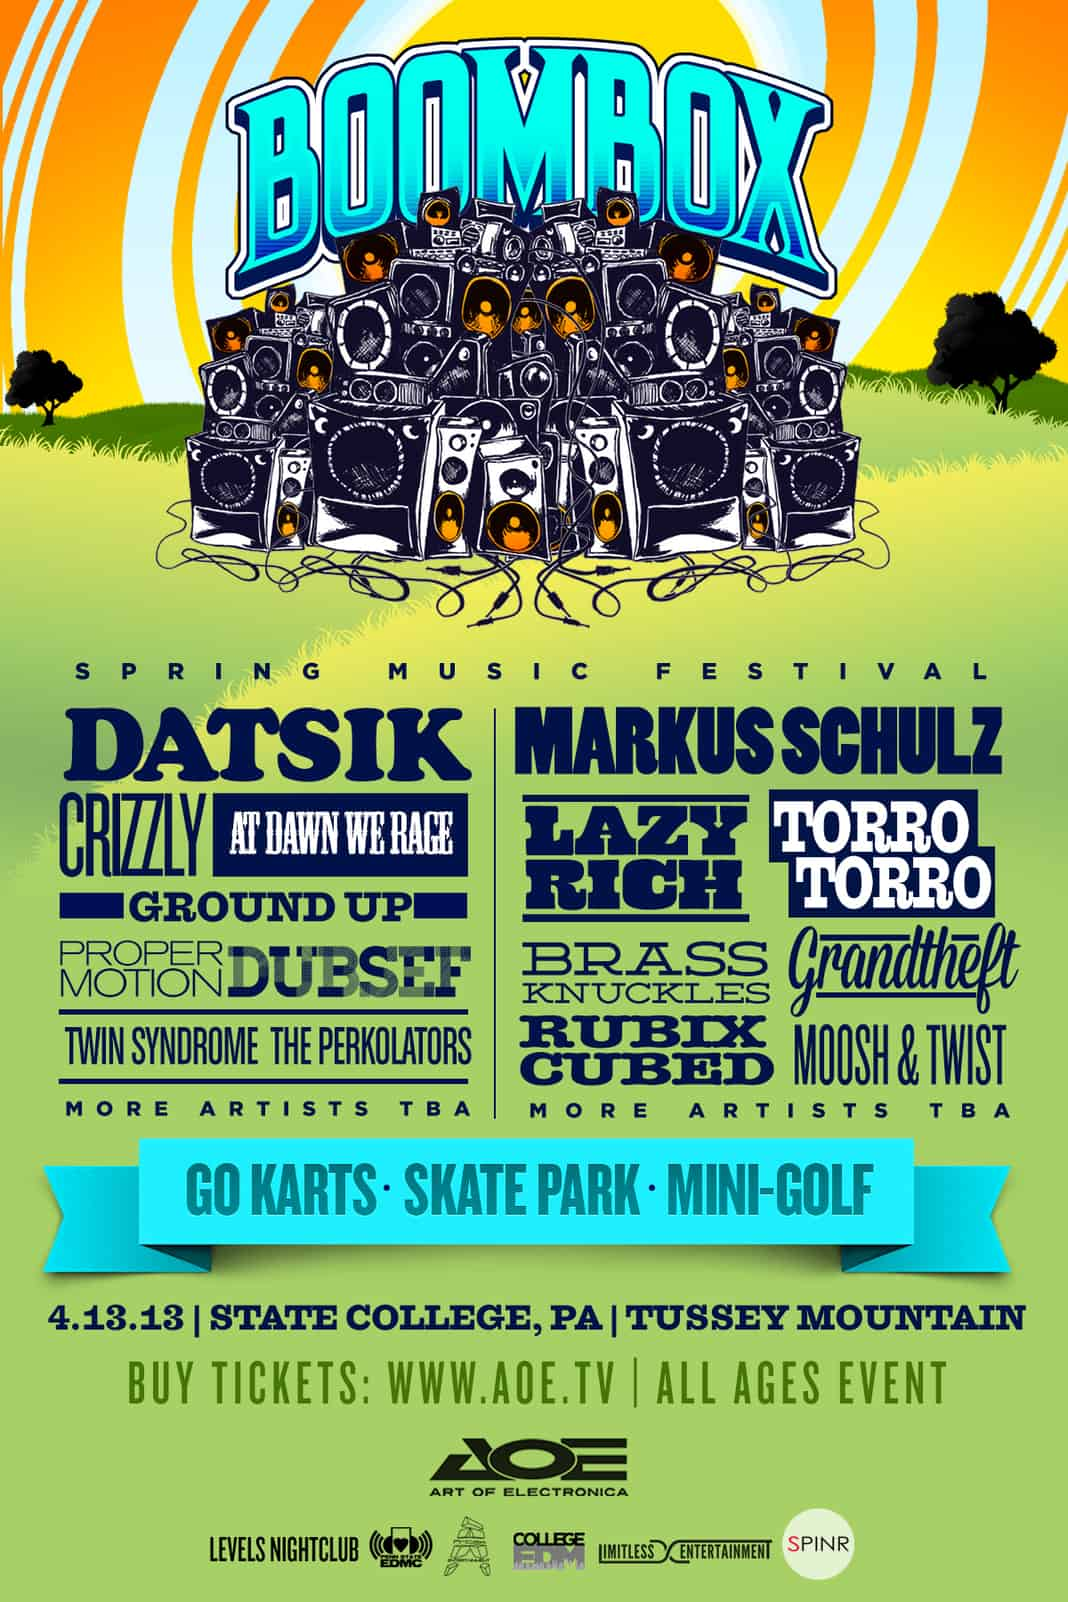 boombox festival flyer